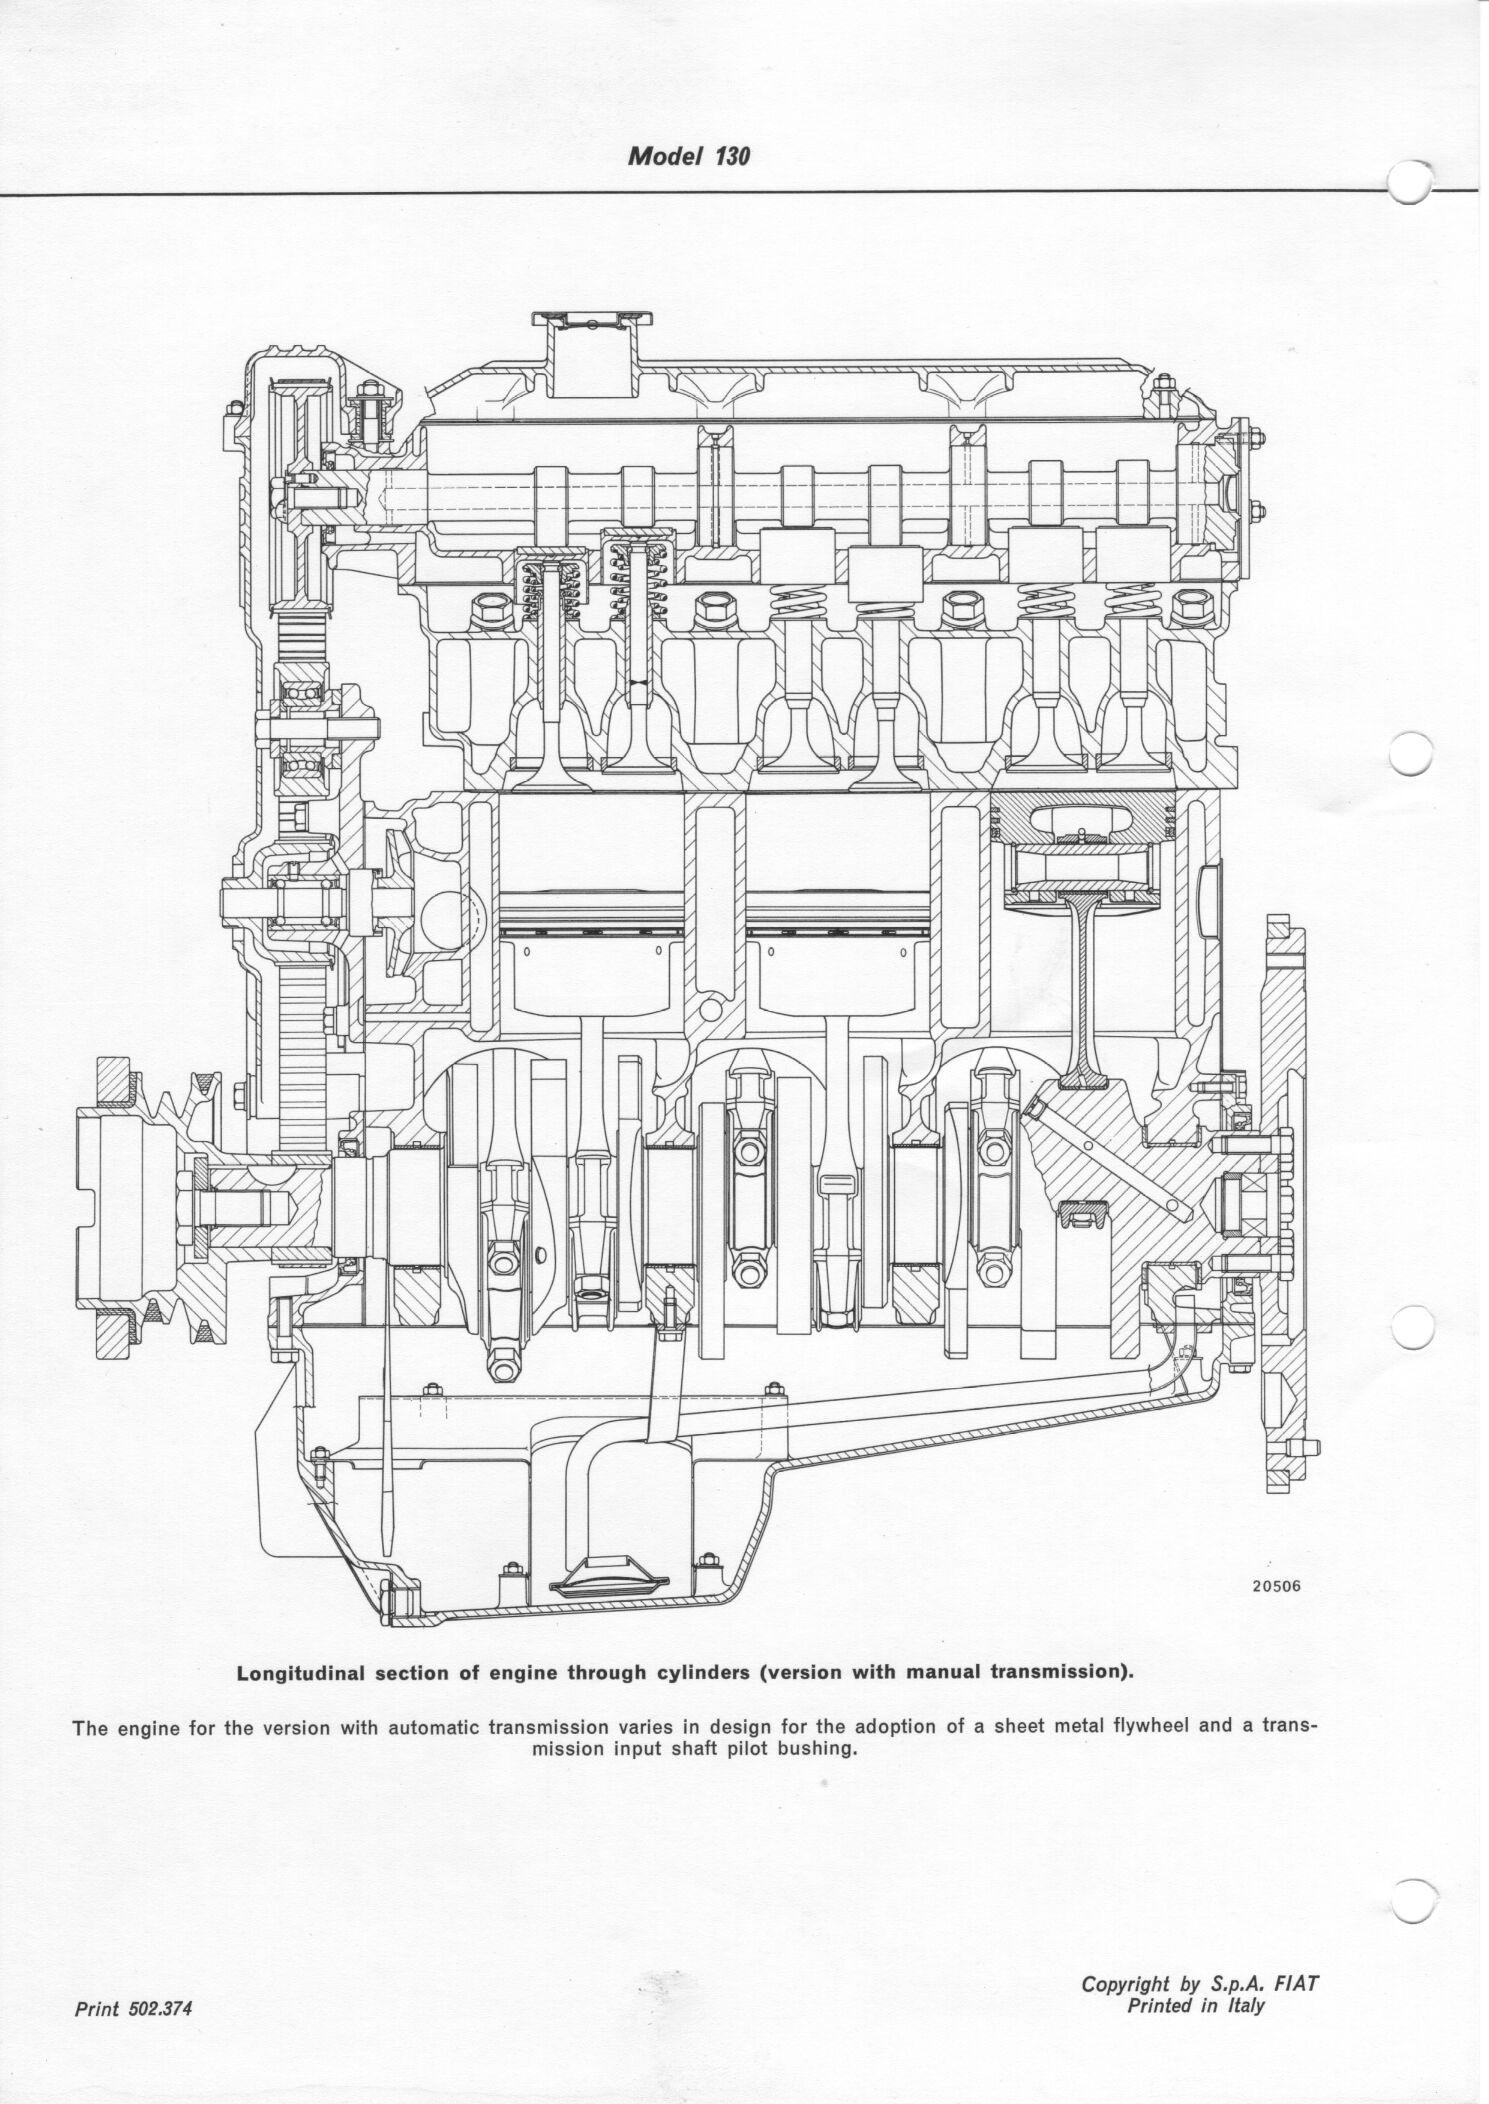 hight resolution of fiat 130 engine manual fiat 130 heaven diagram fiat manual fiat engine schematics